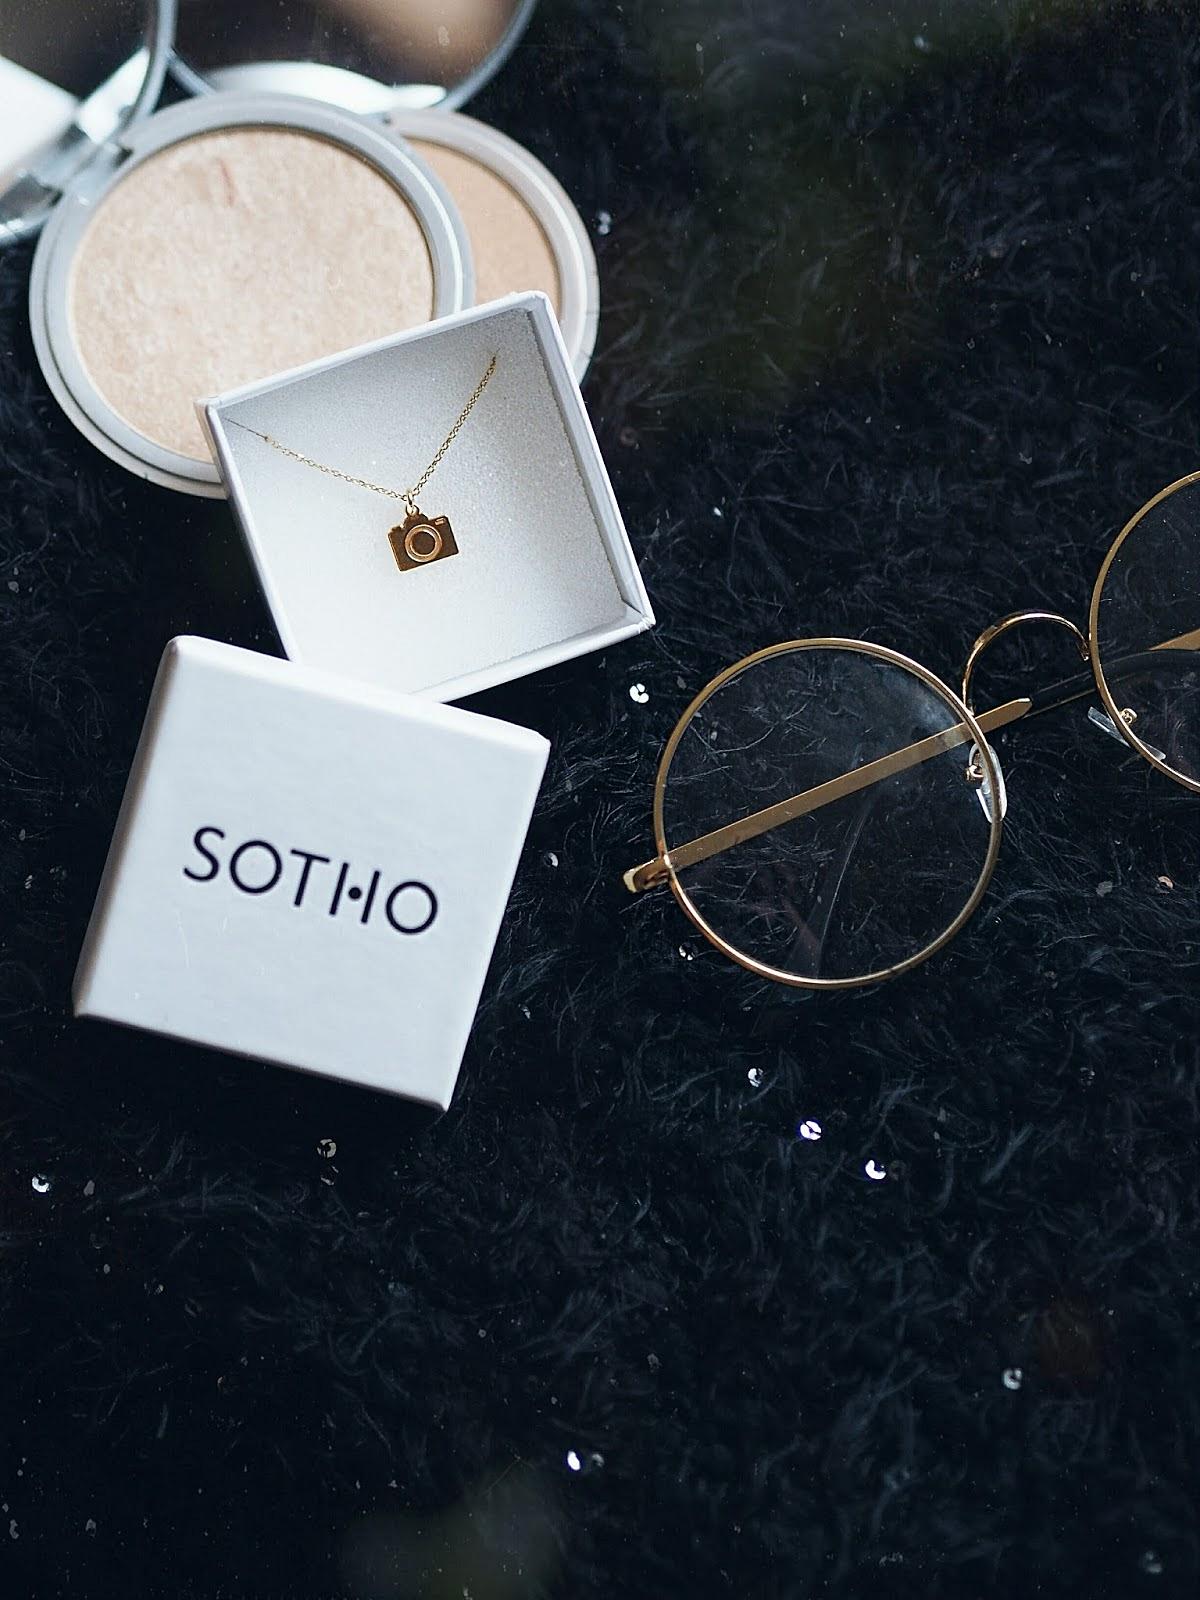 Biżuteria, Sotho, Must have, najlepsza biżuteria, jesień, autumn vibes